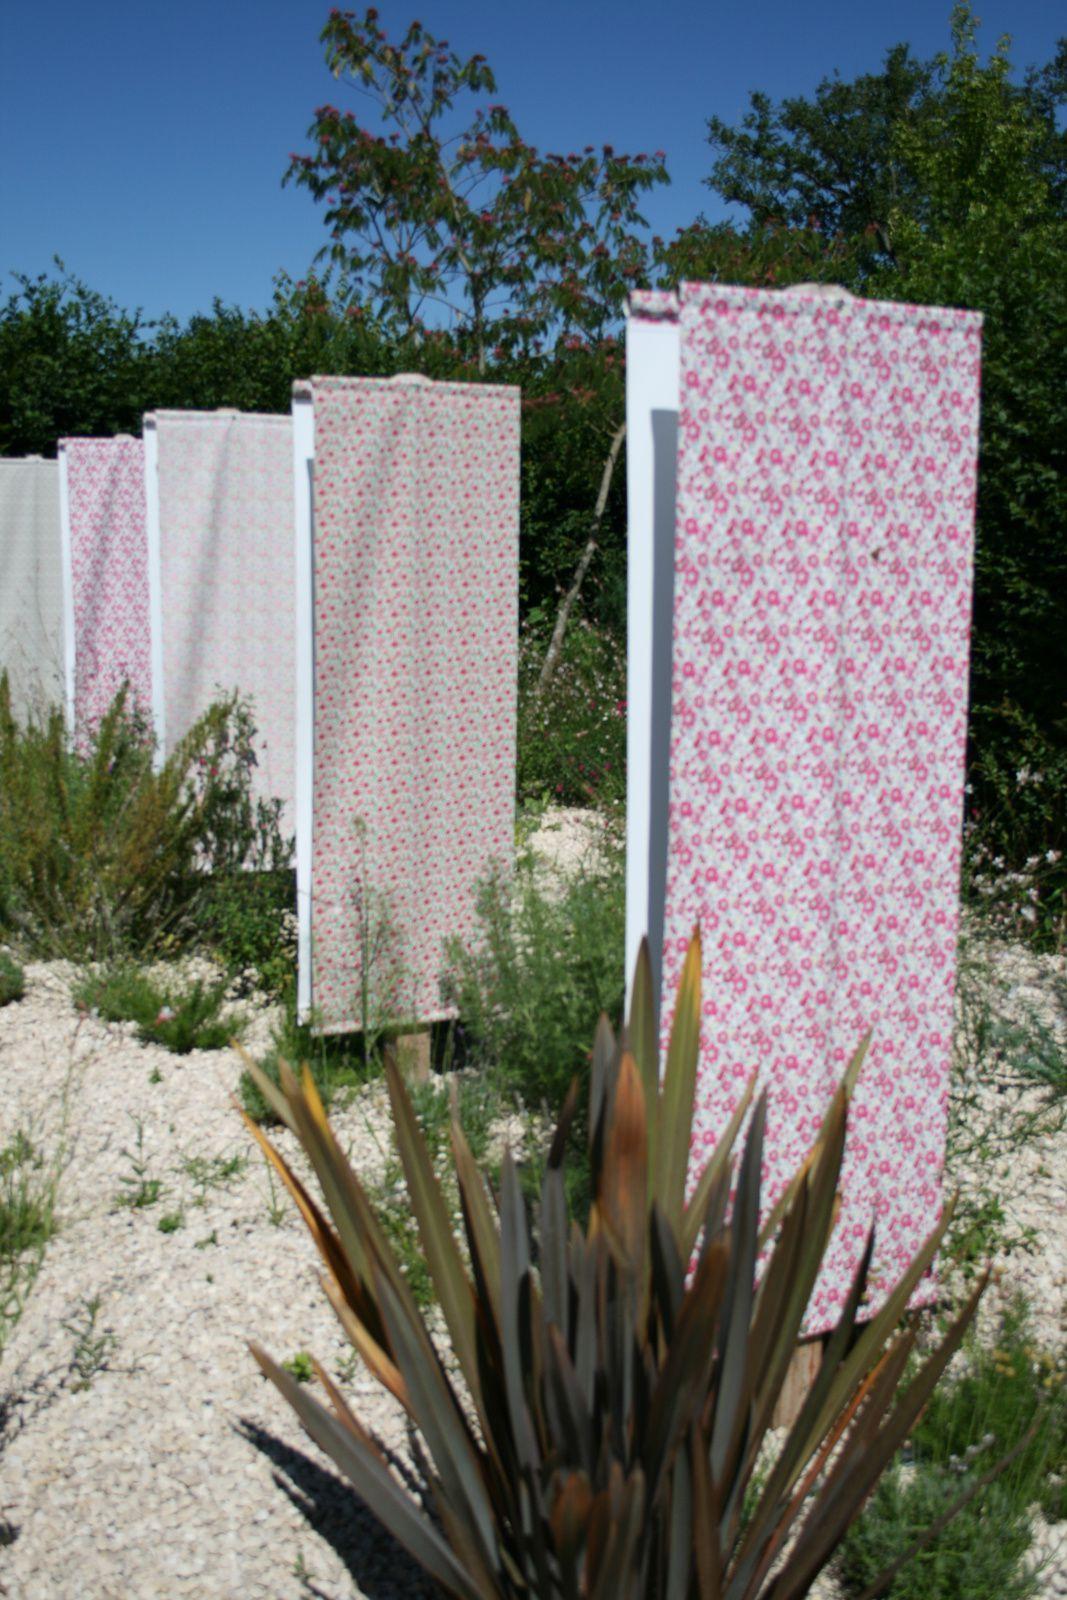 #rose #jardins #exposition #chaumontsurloire #charlotteblabla blog